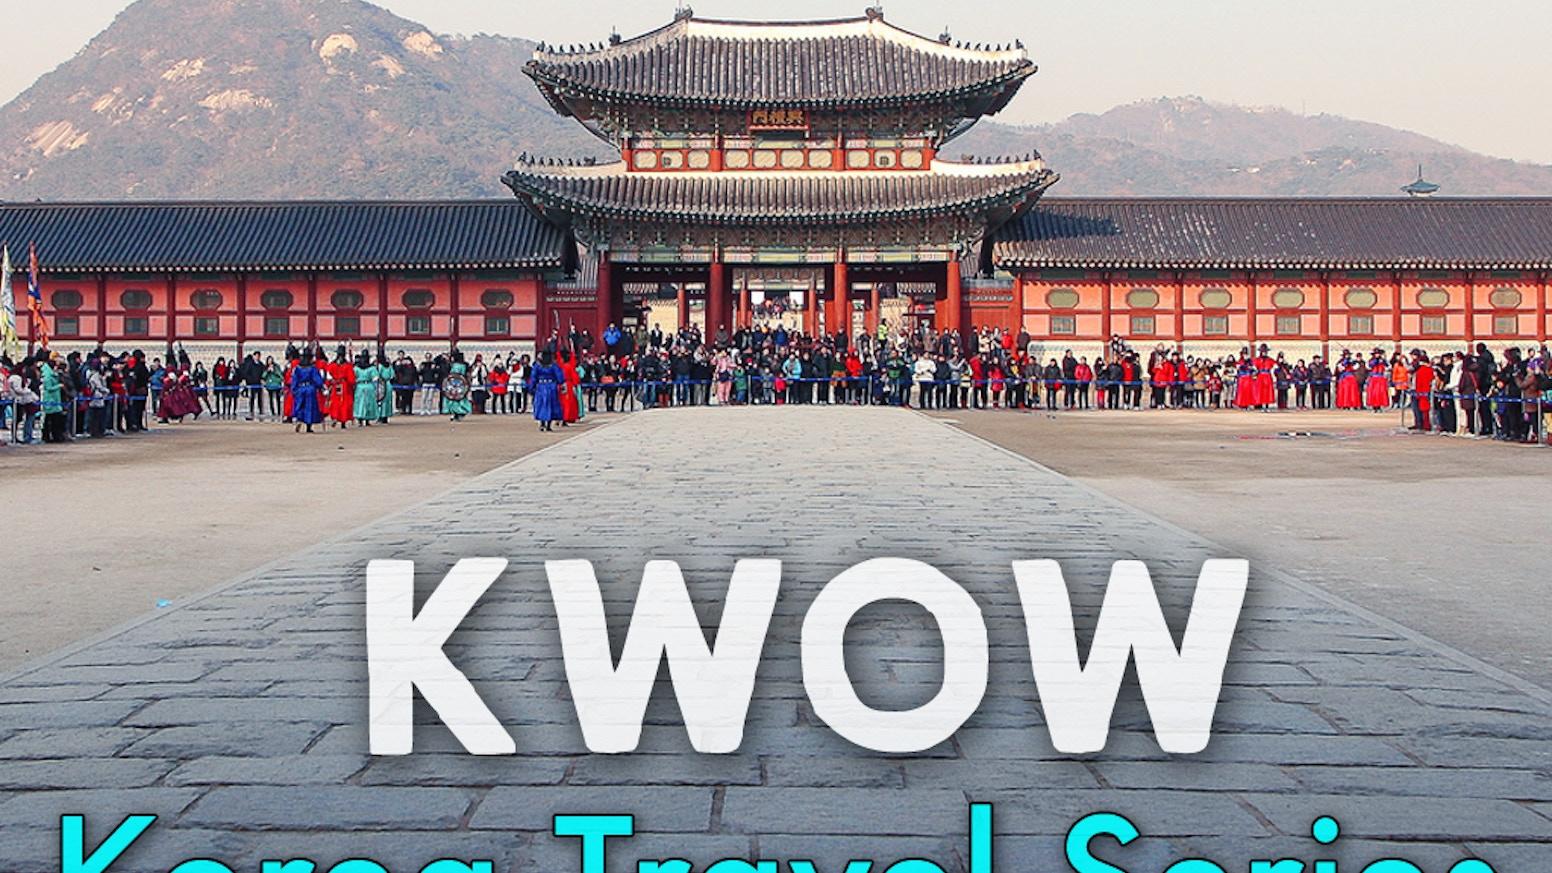 KWOW: 30 Travel Episodes of Korea by Mina Oh » Community — Kickstarter